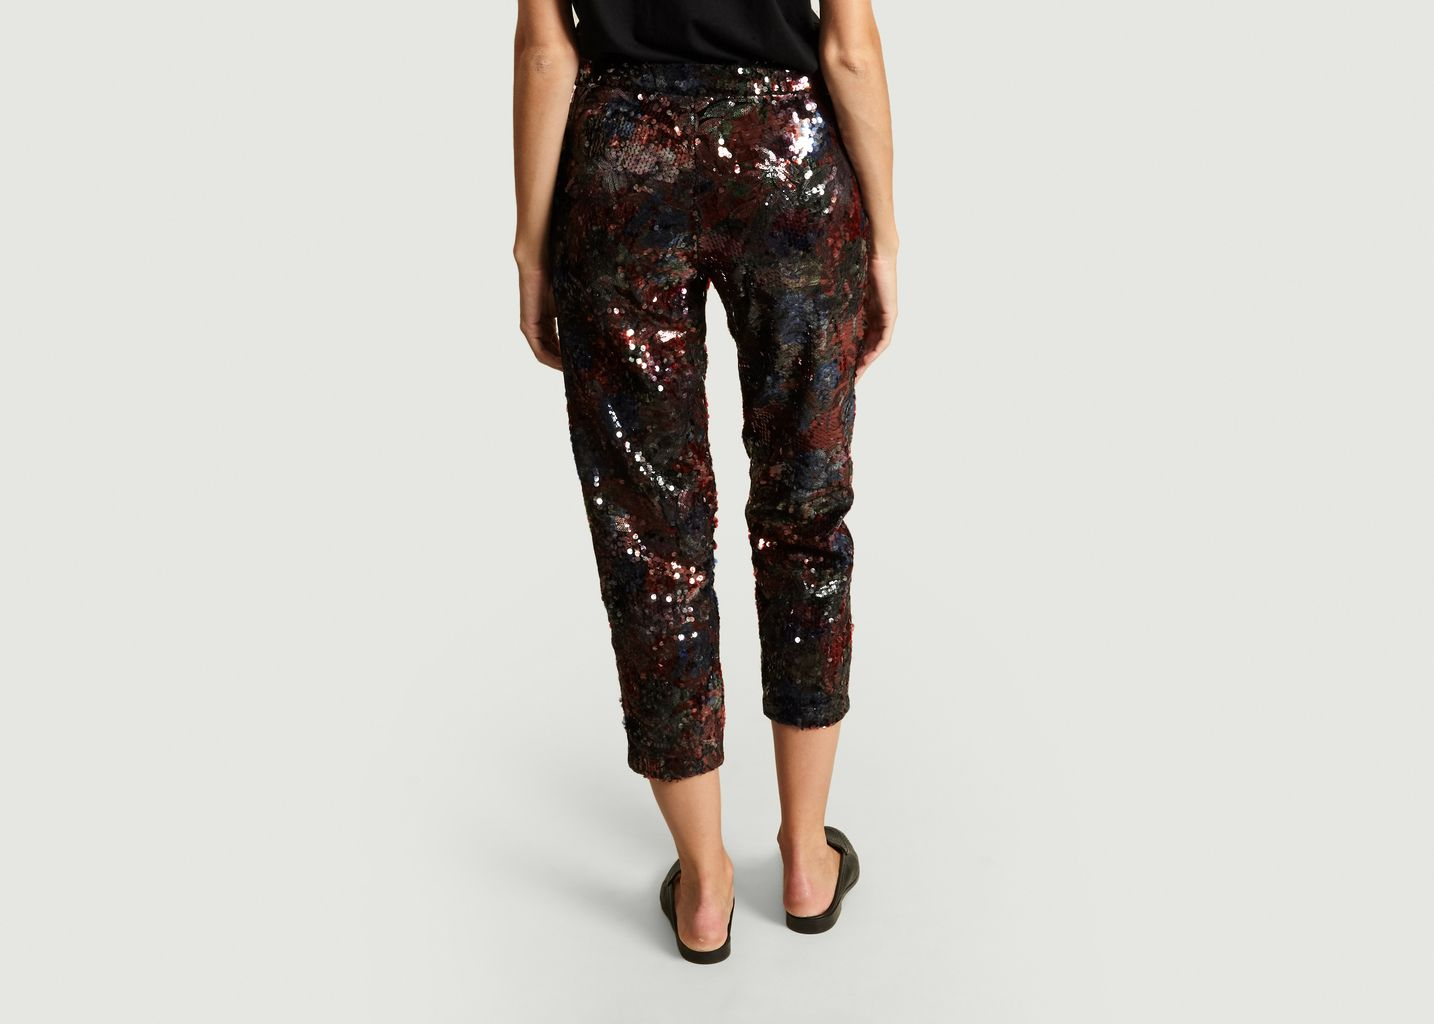 Pantalon Bowijanet Sequins - Roseanna